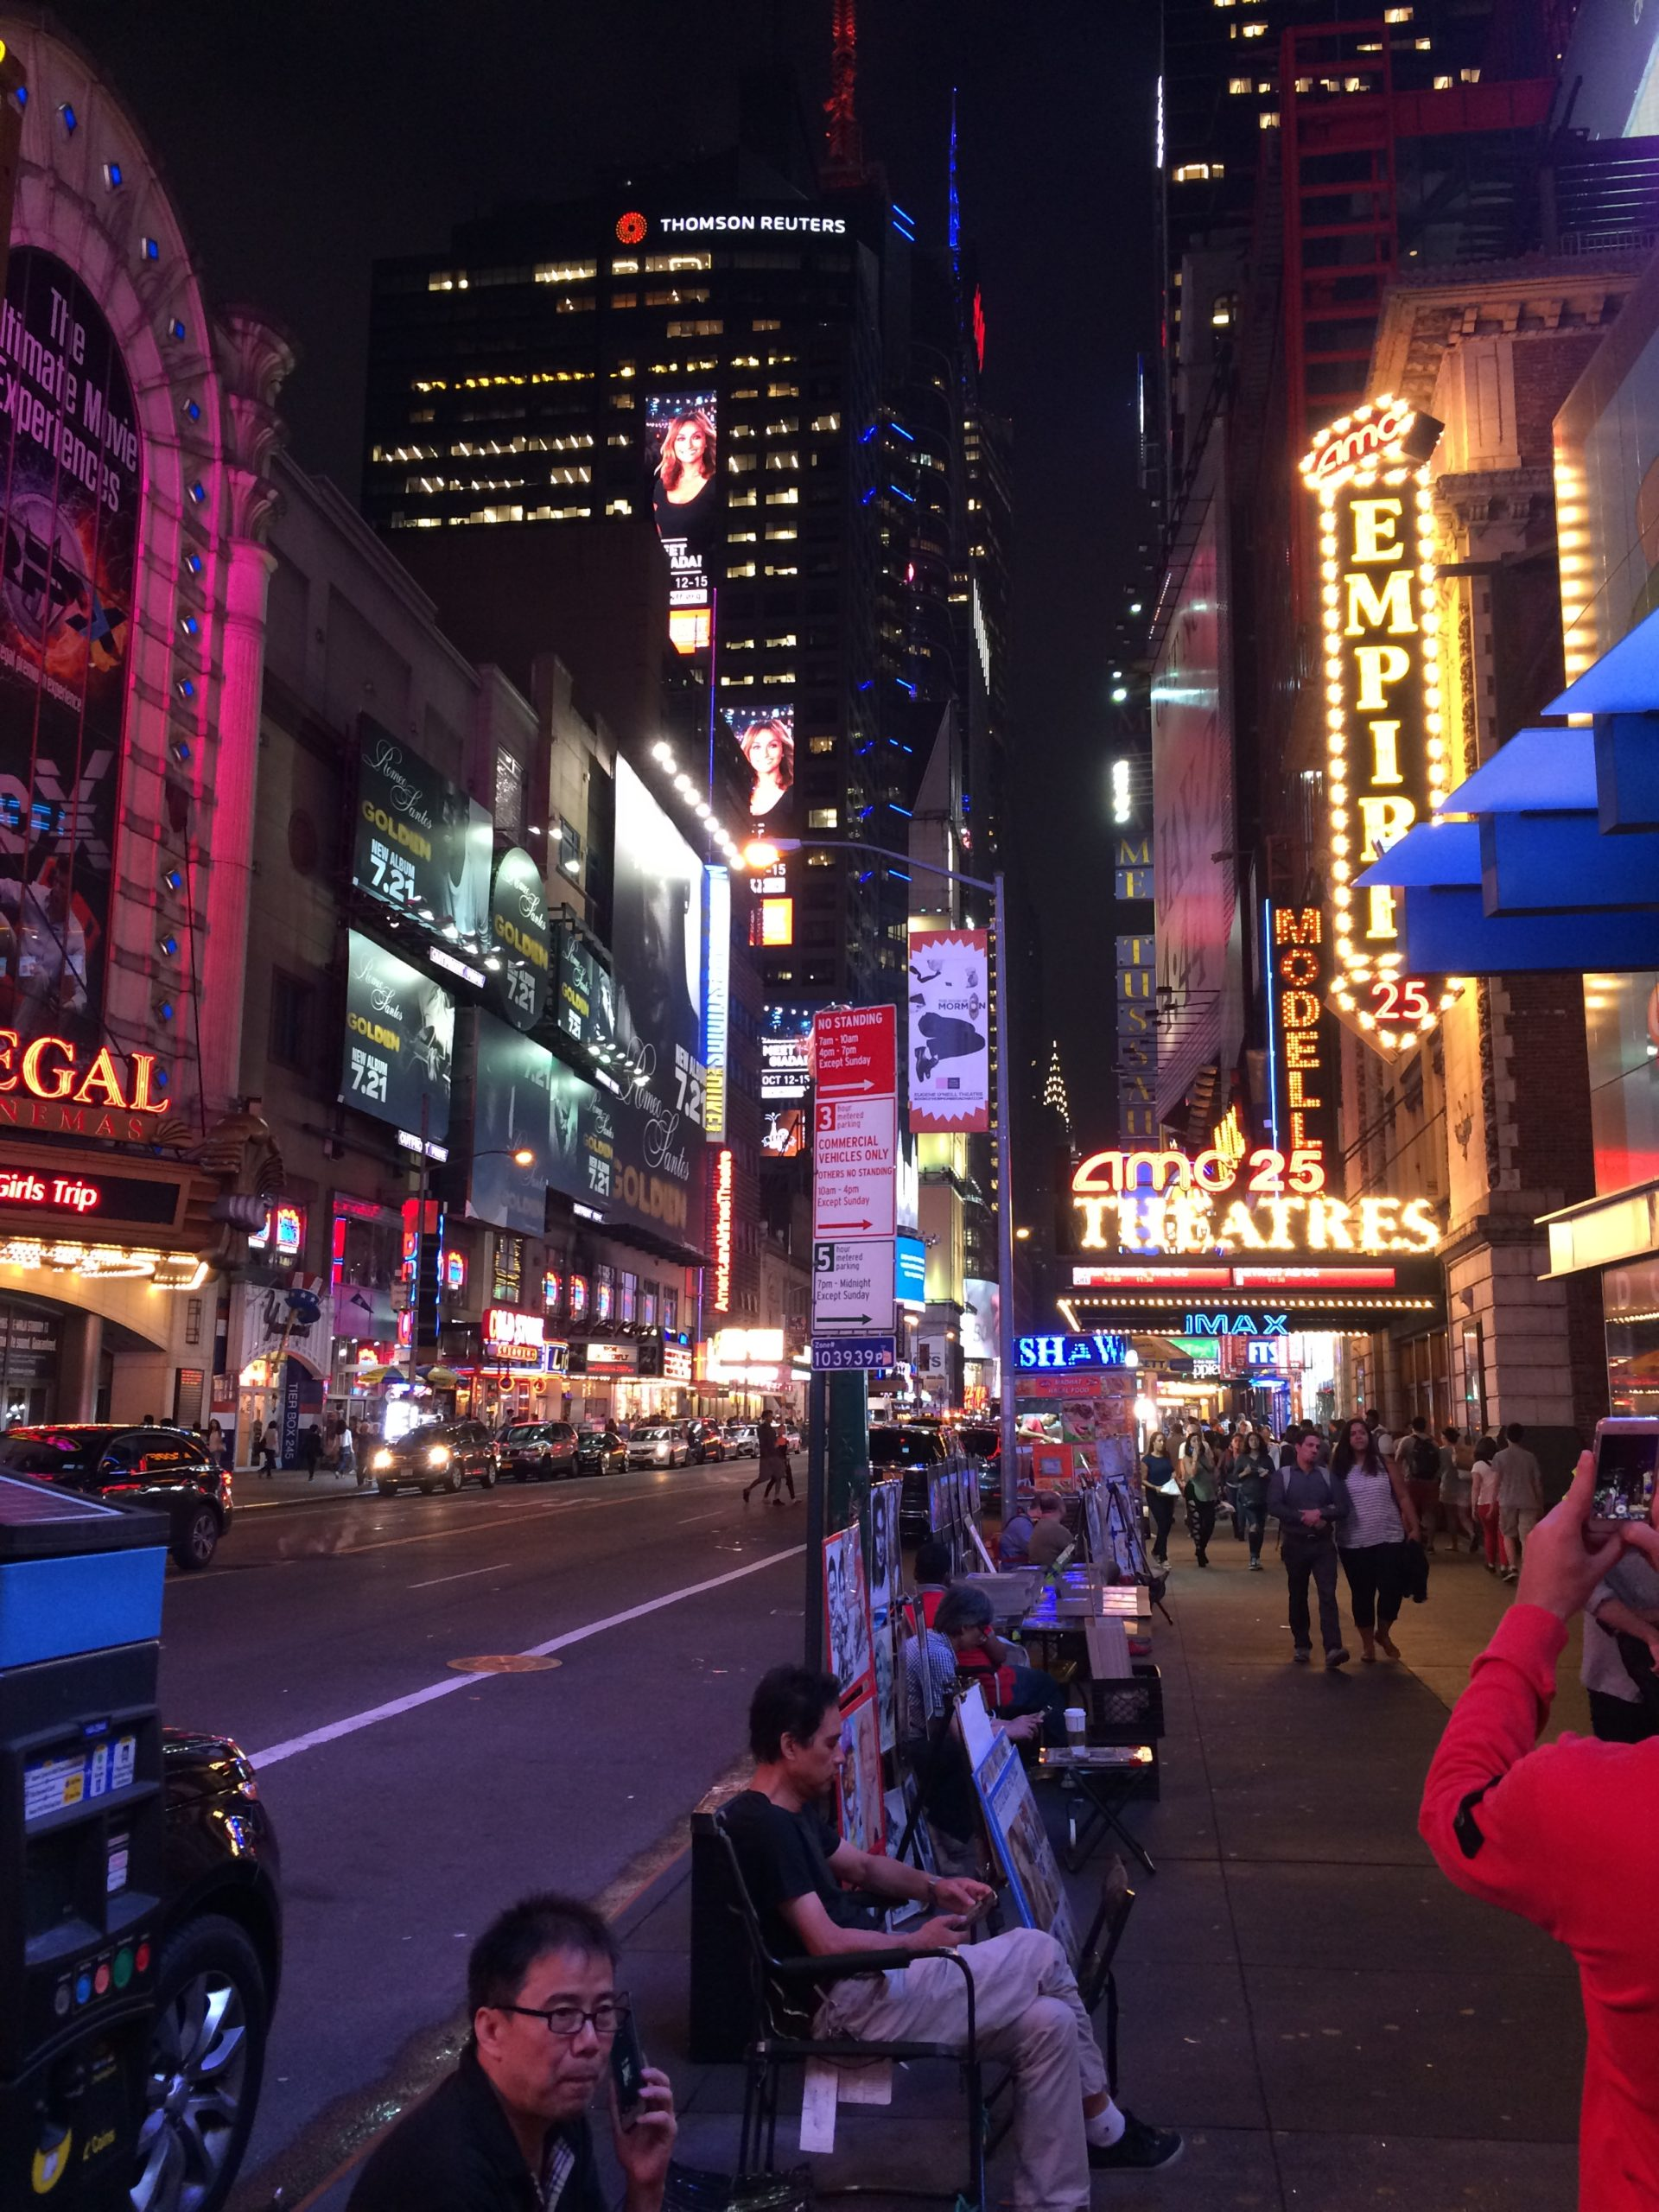 42nd Street night walk